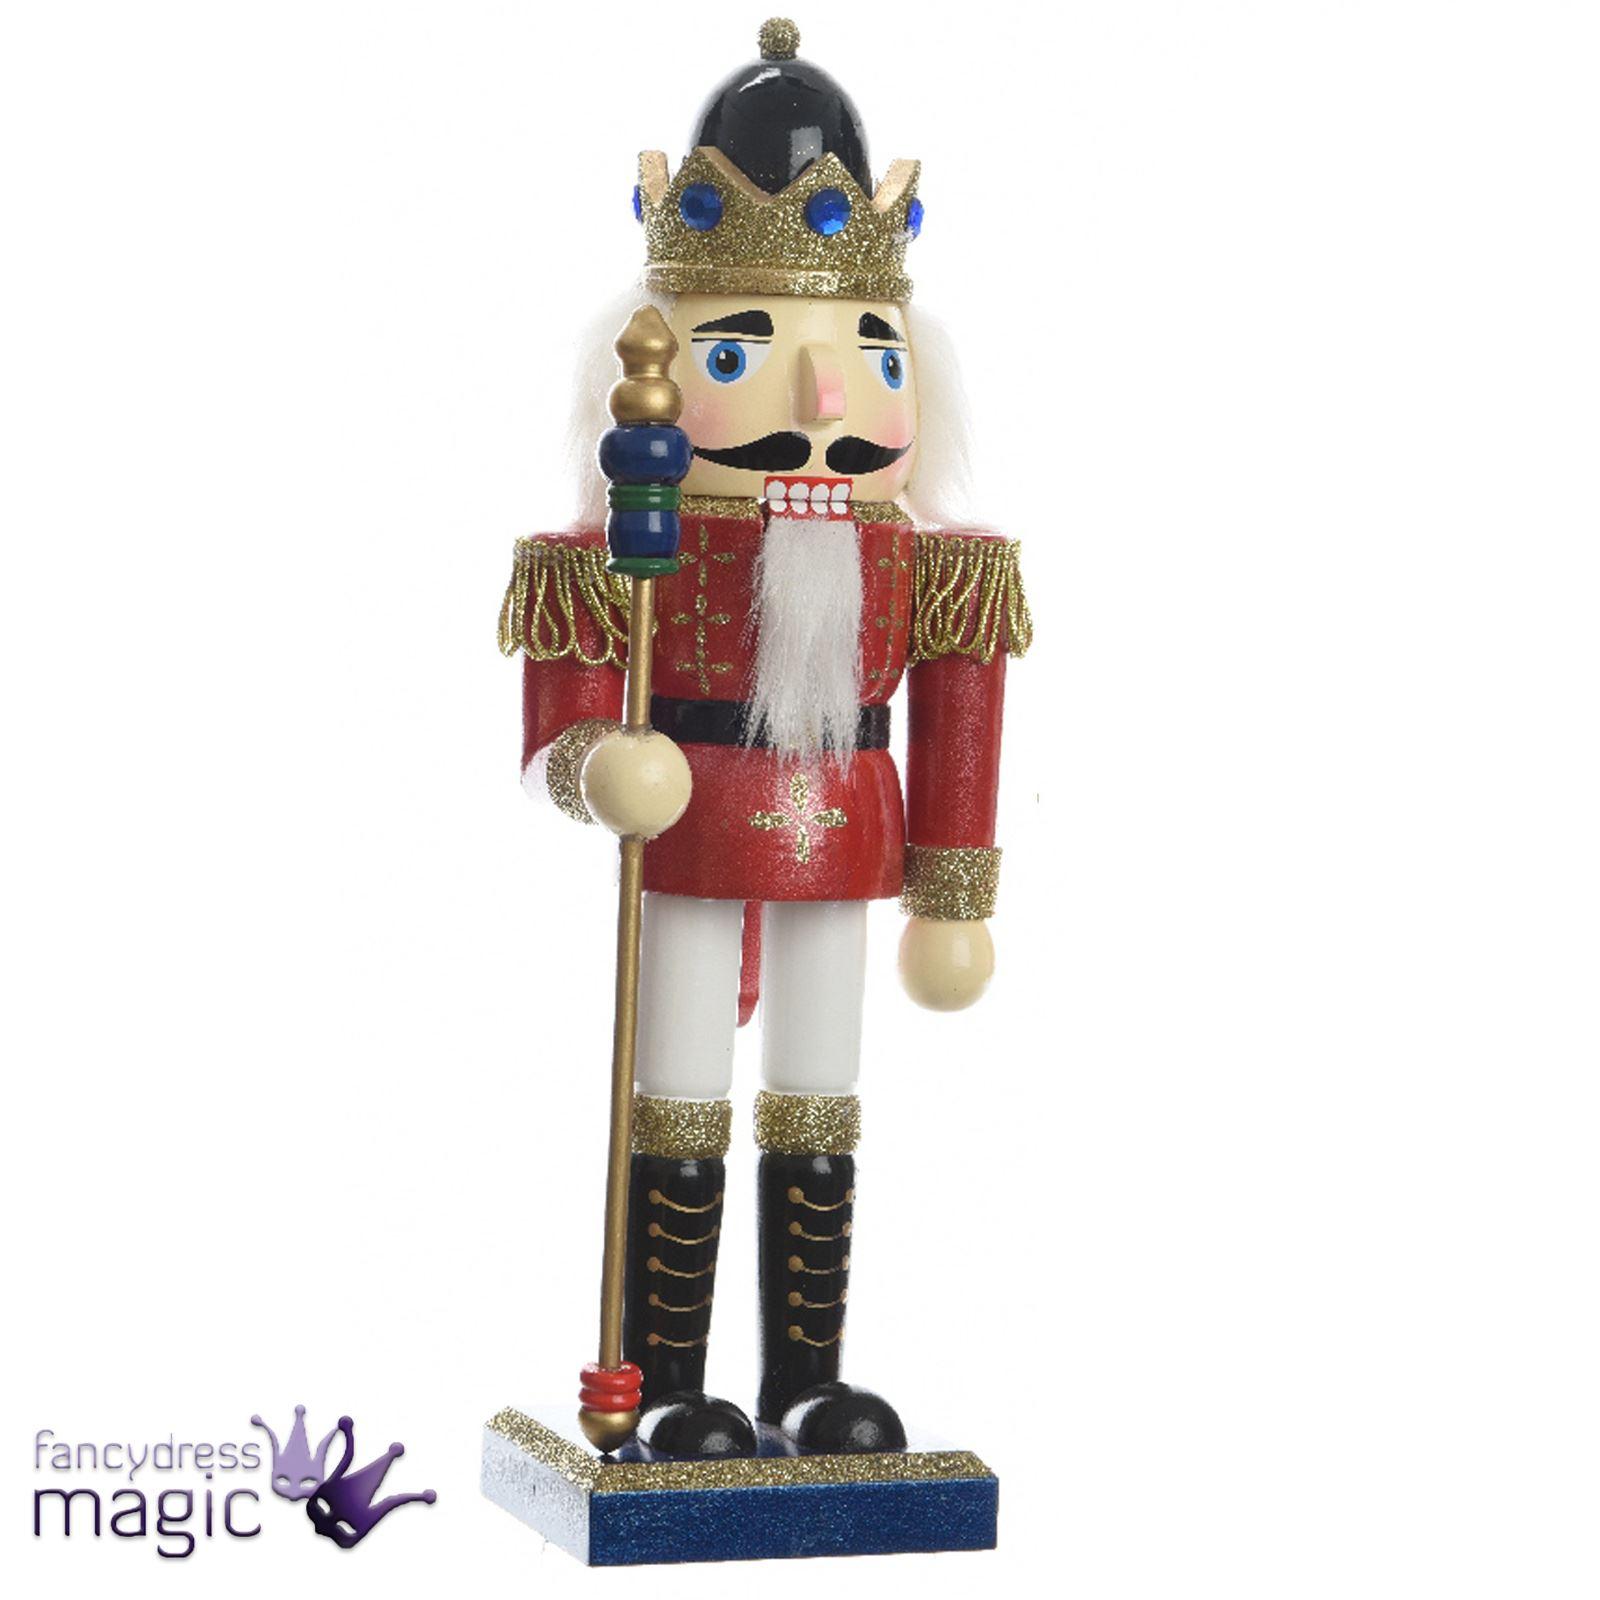 Kaemingk Wood Traditional Soldier Nutcracker Christmas Ornament ...